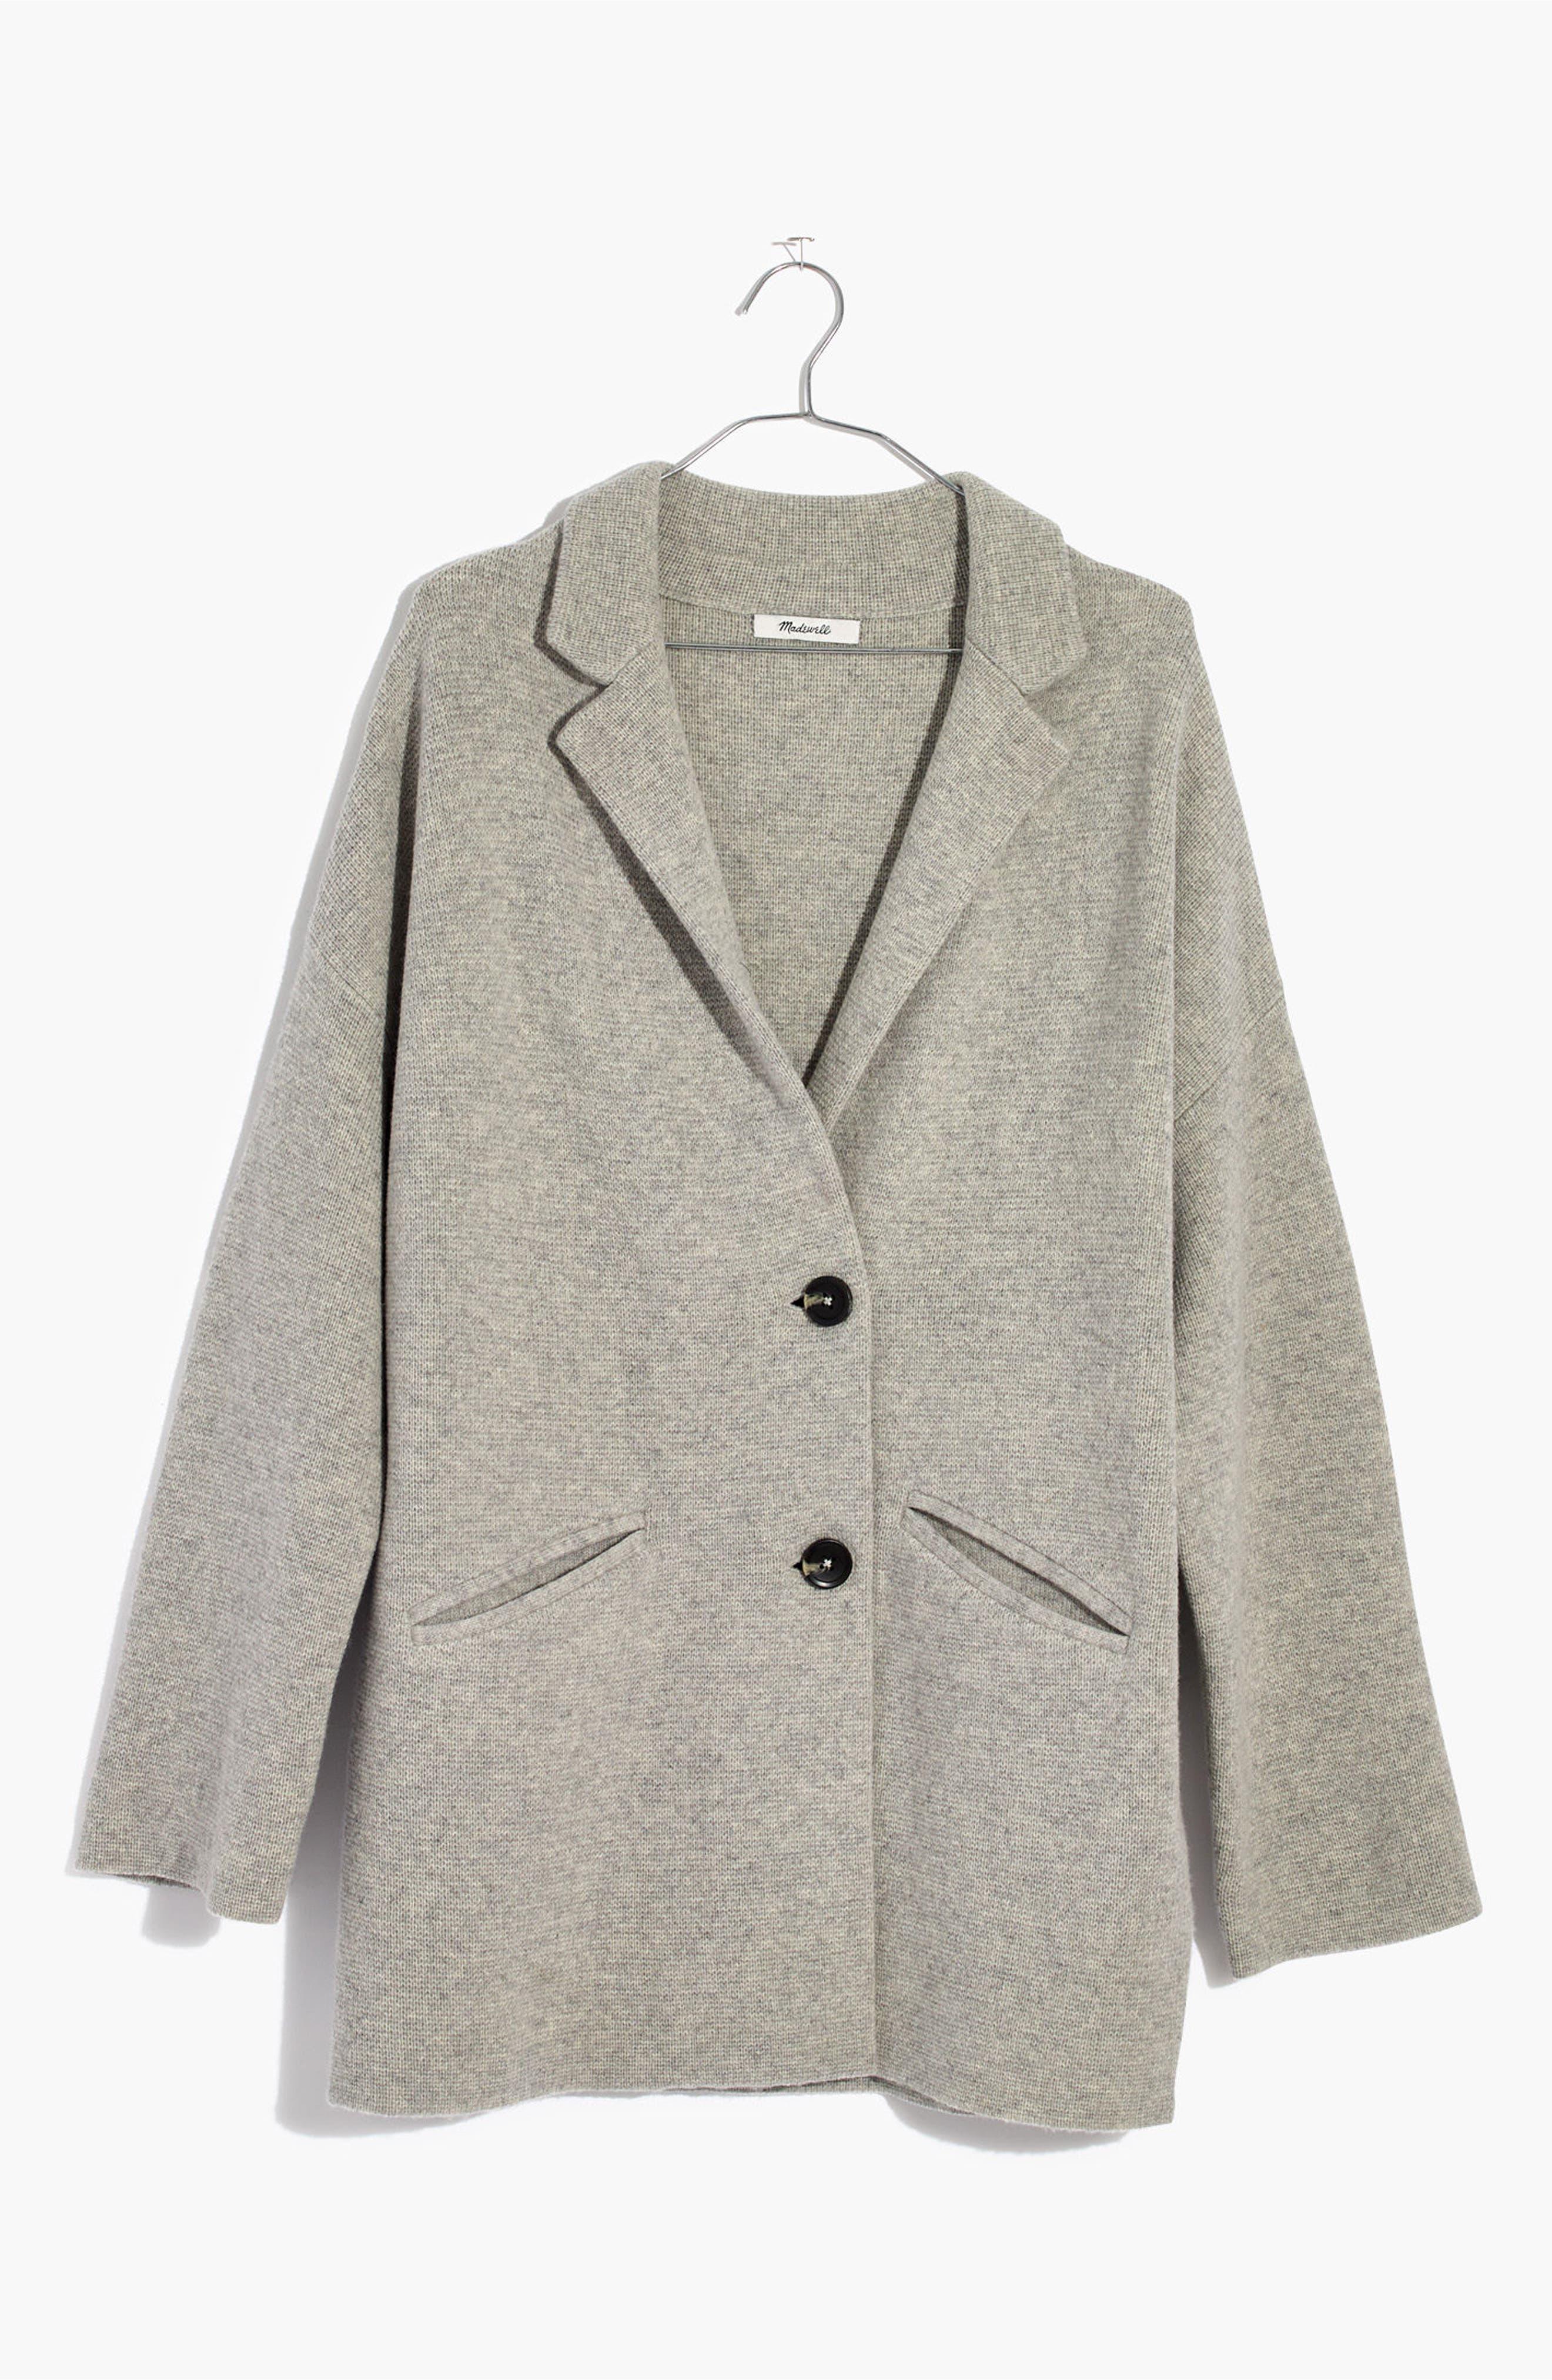 Blazer Sweater Jacket,                             Alternate thumbnail 6, color,                             020